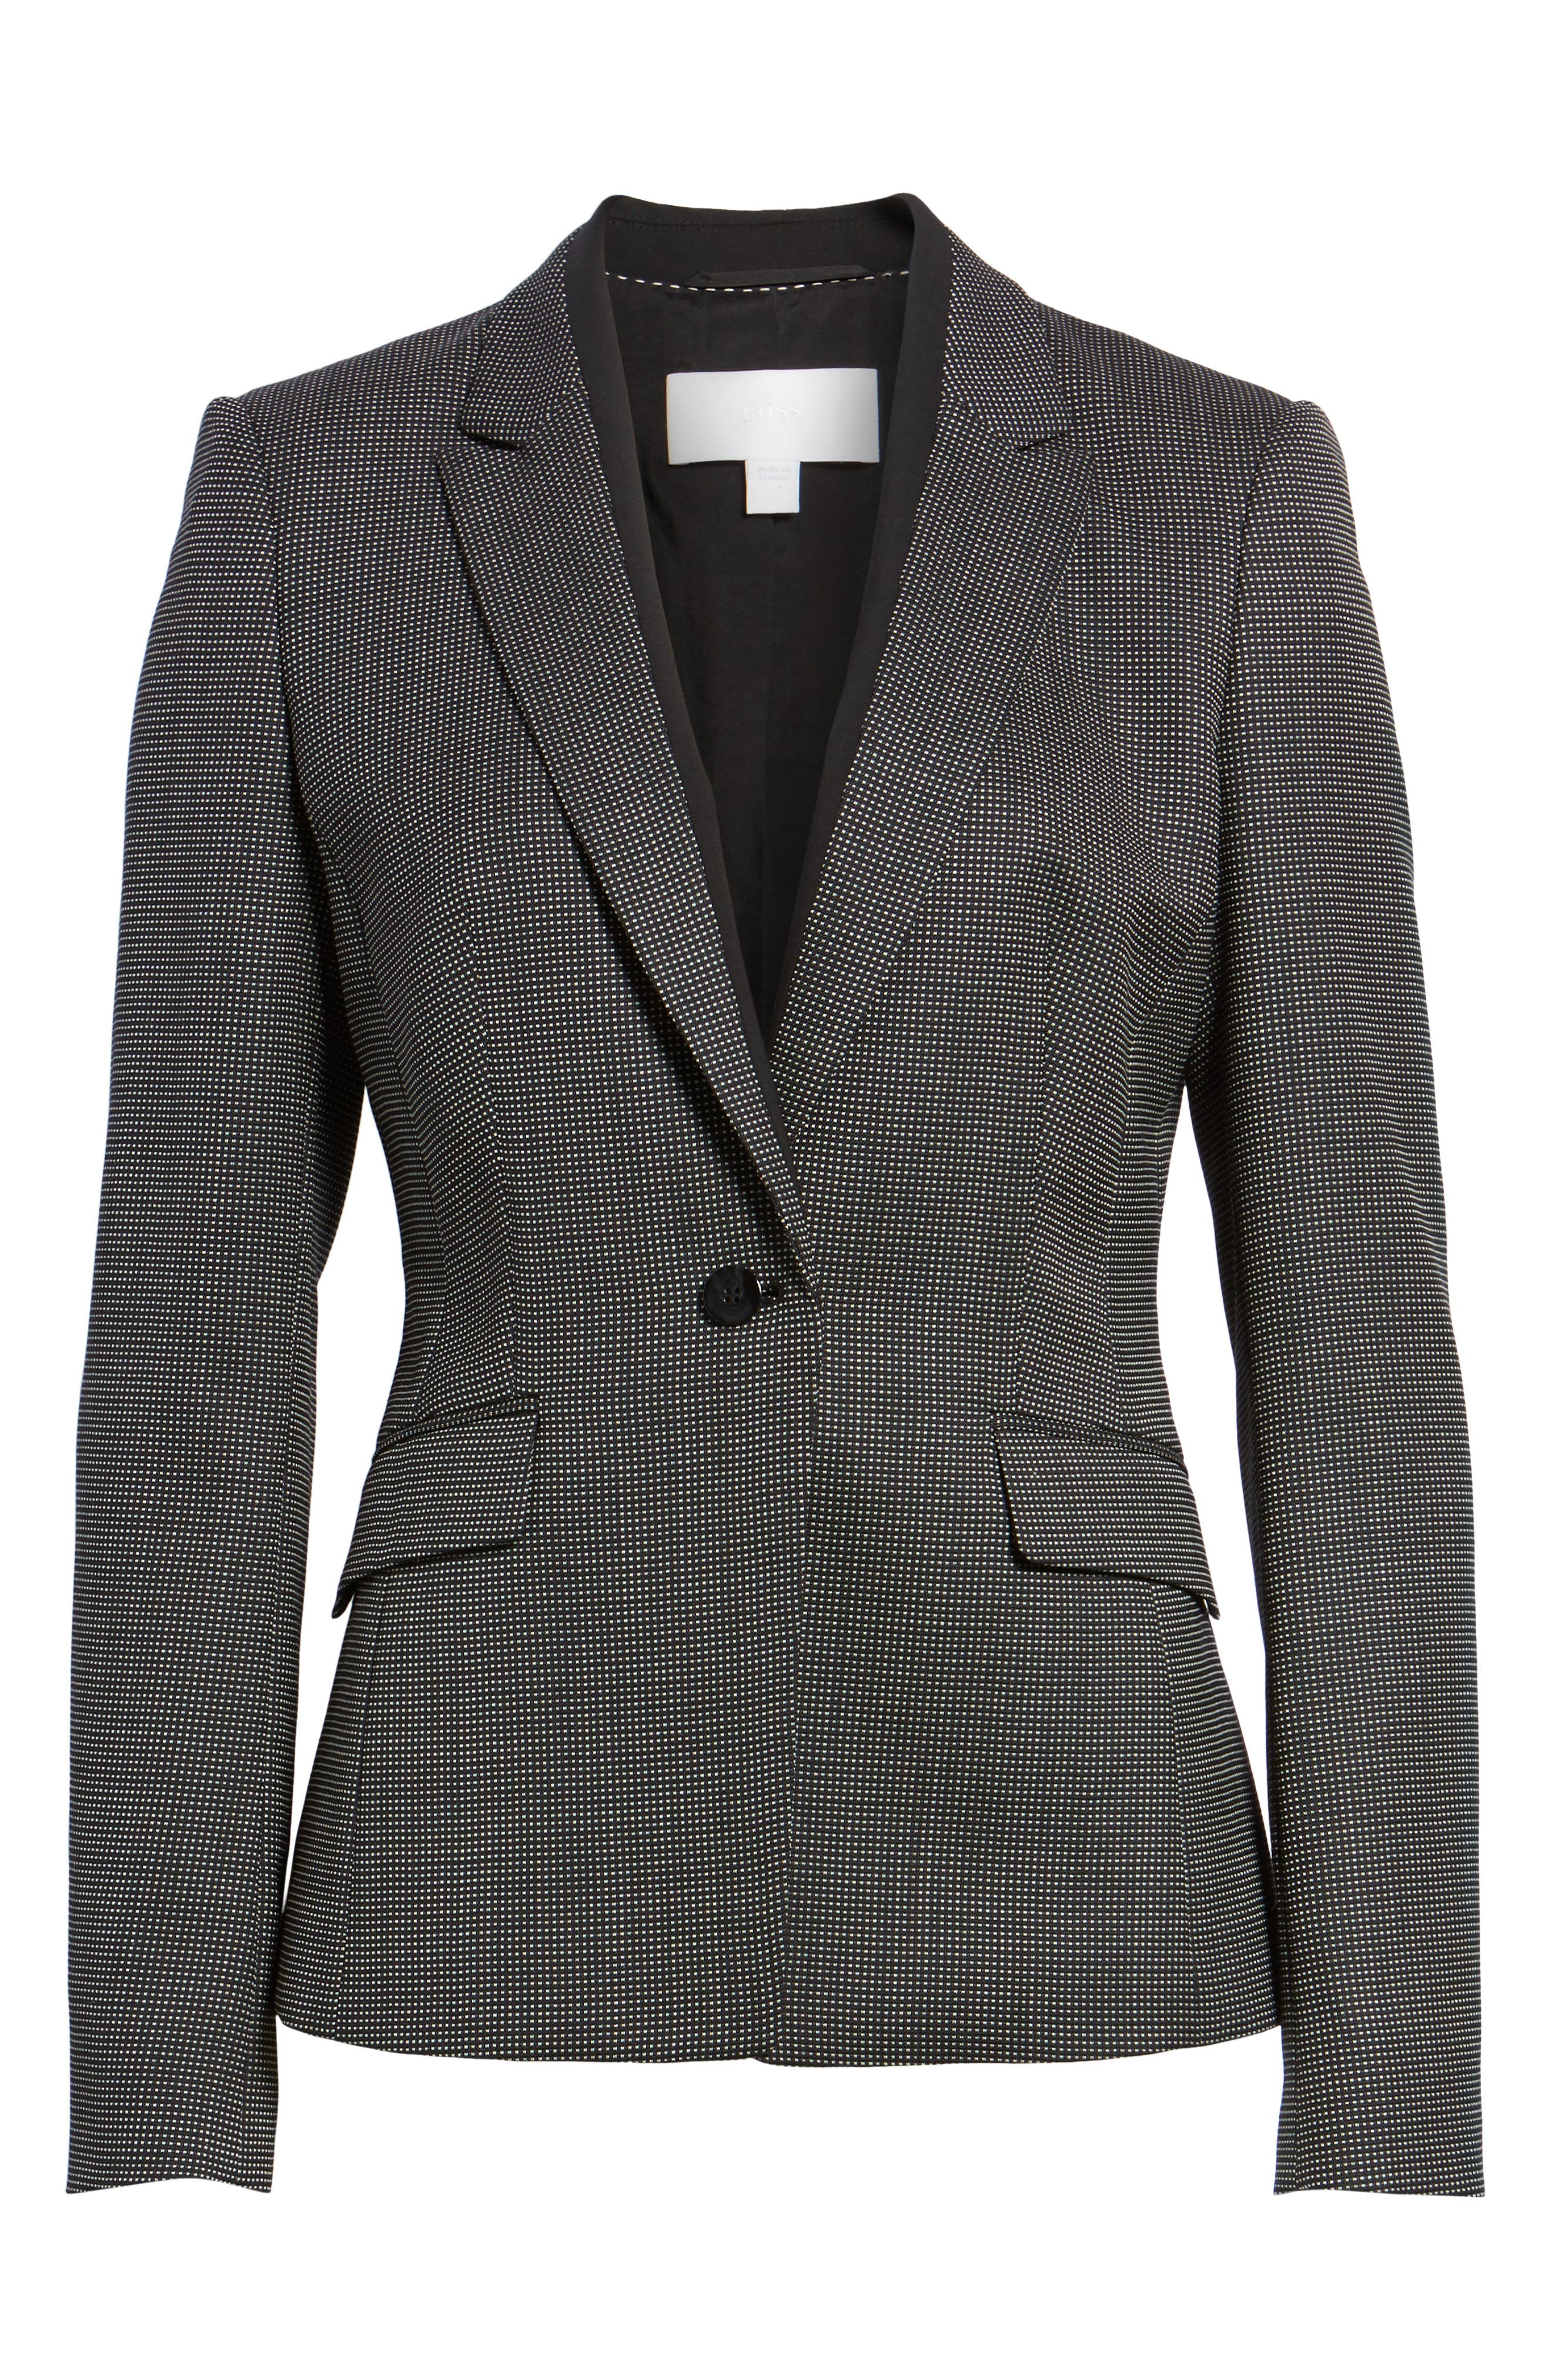 Jeresa Check Stretch Wool Suit Jacket,                             Alternate thumbnail 6, color,                             Black Fantasy